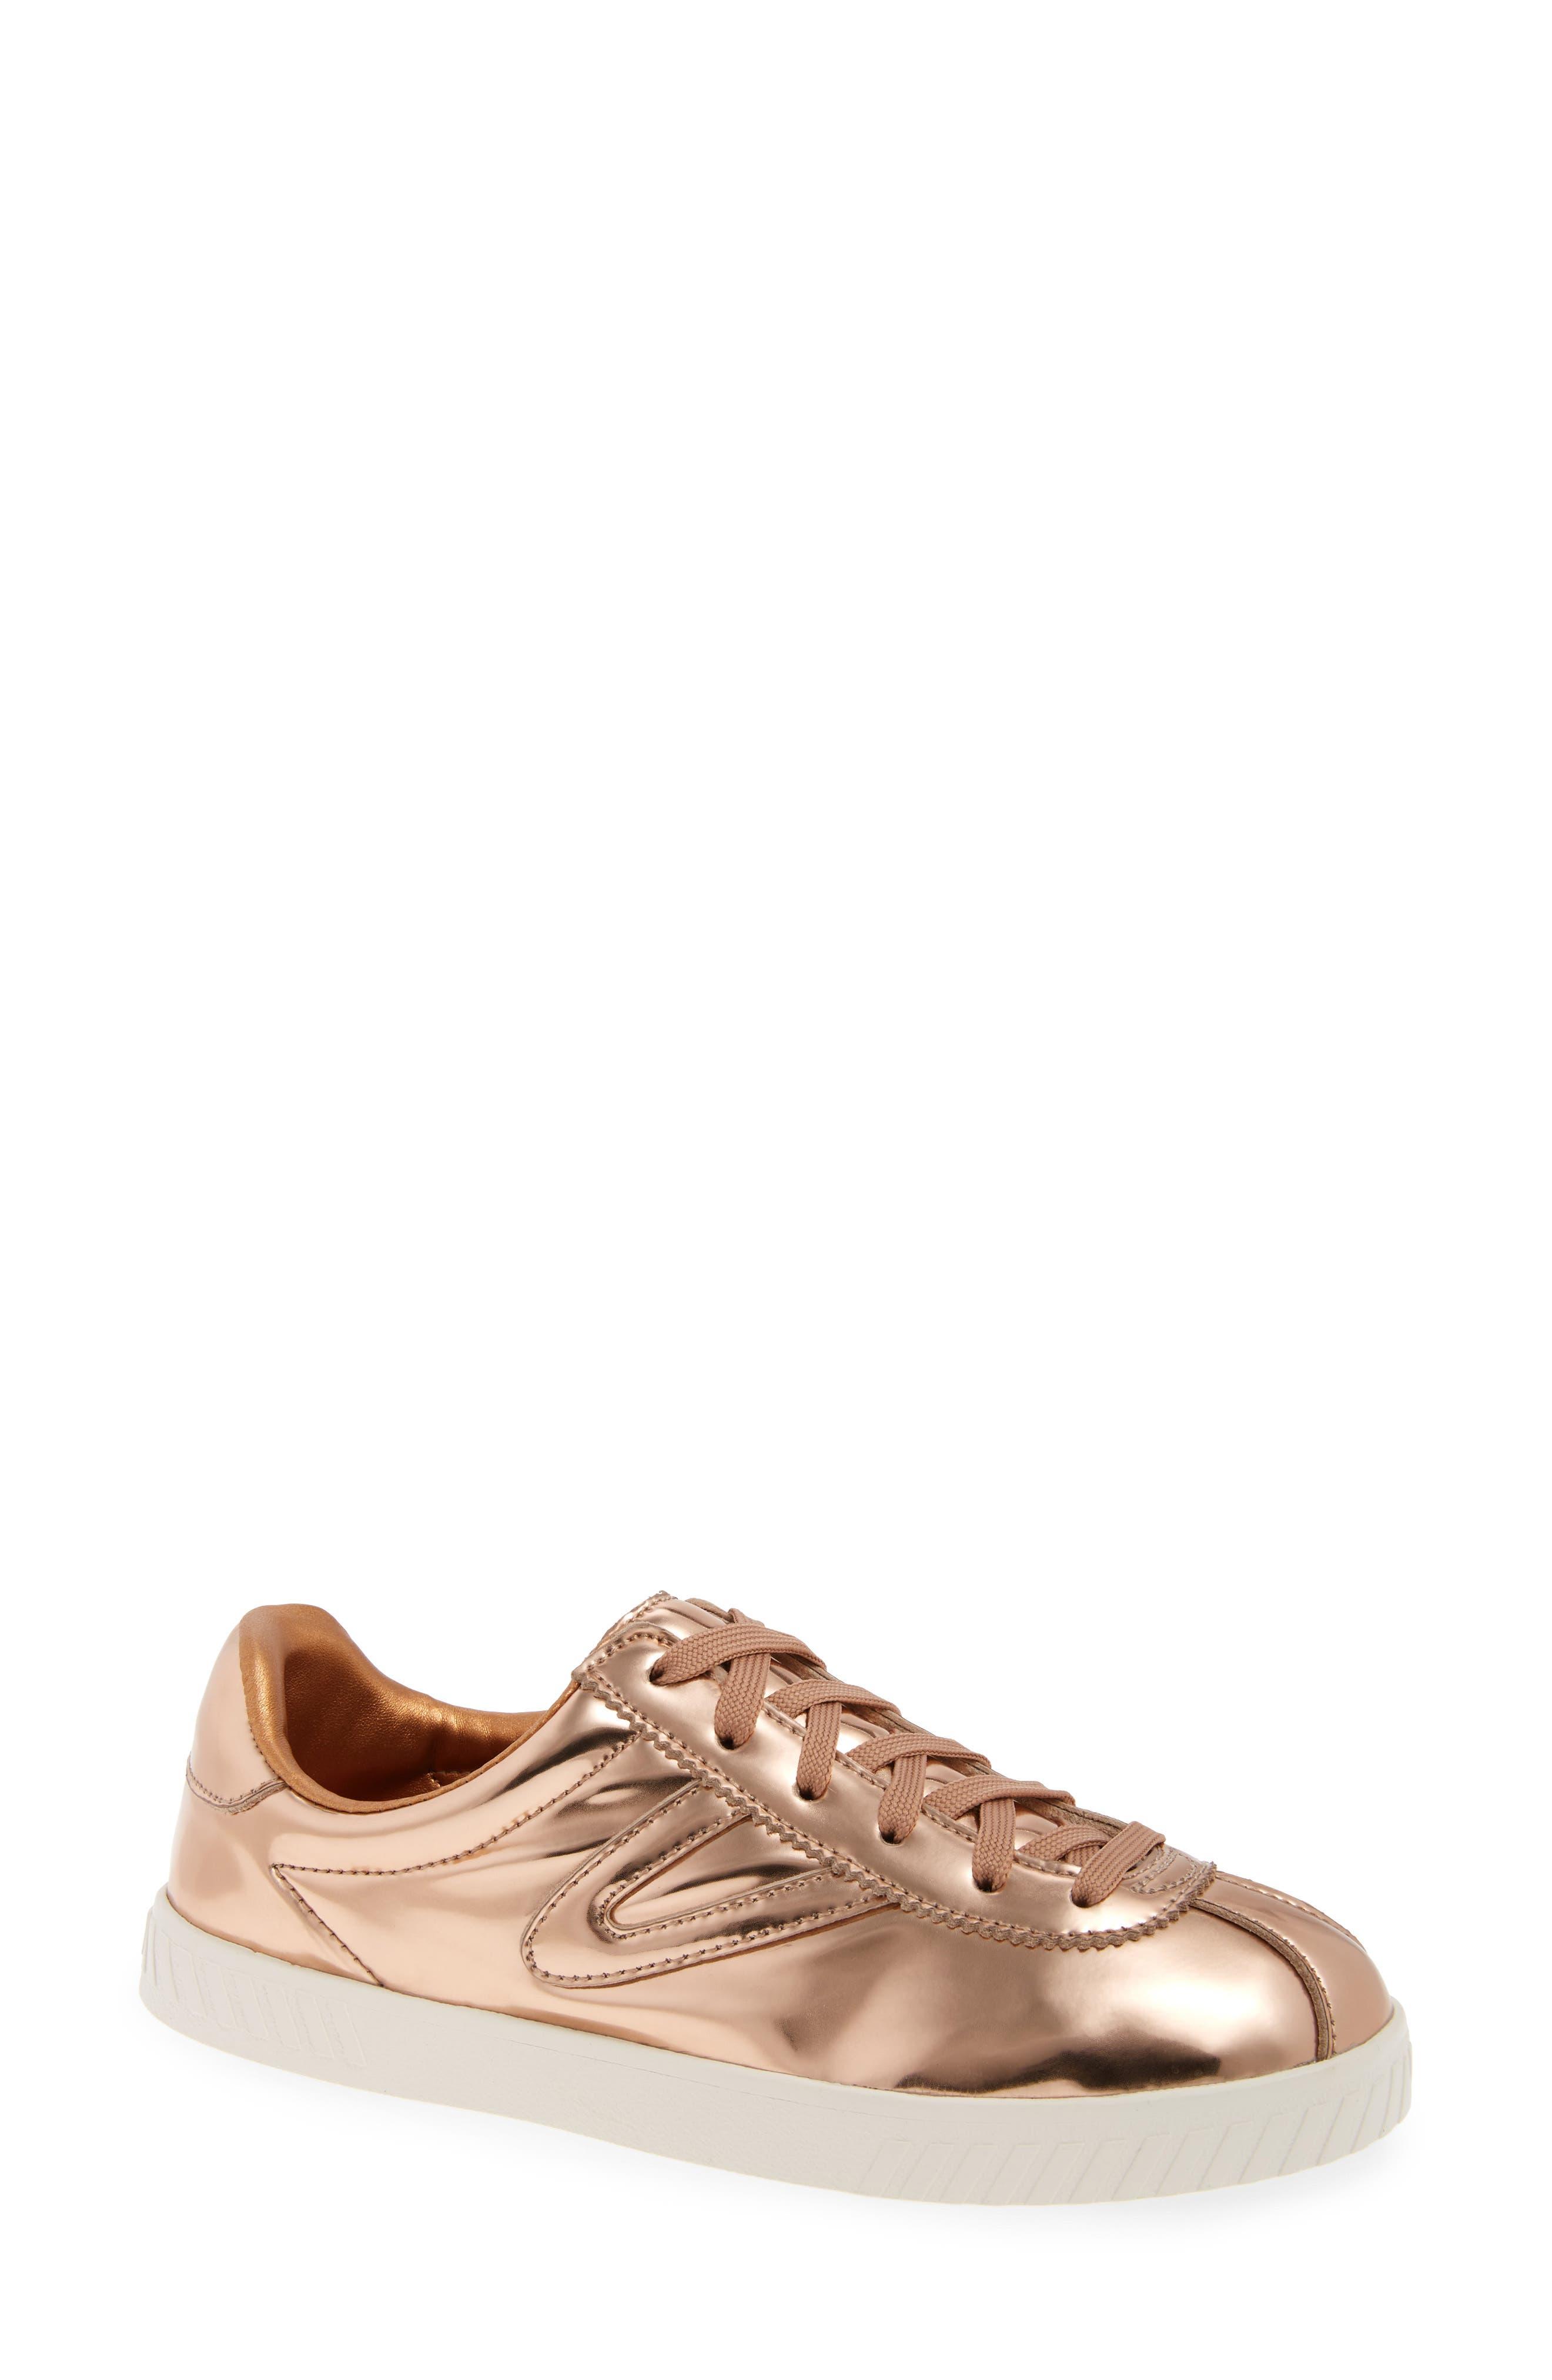 Tretorn Camden 2 Sneaker (Women)